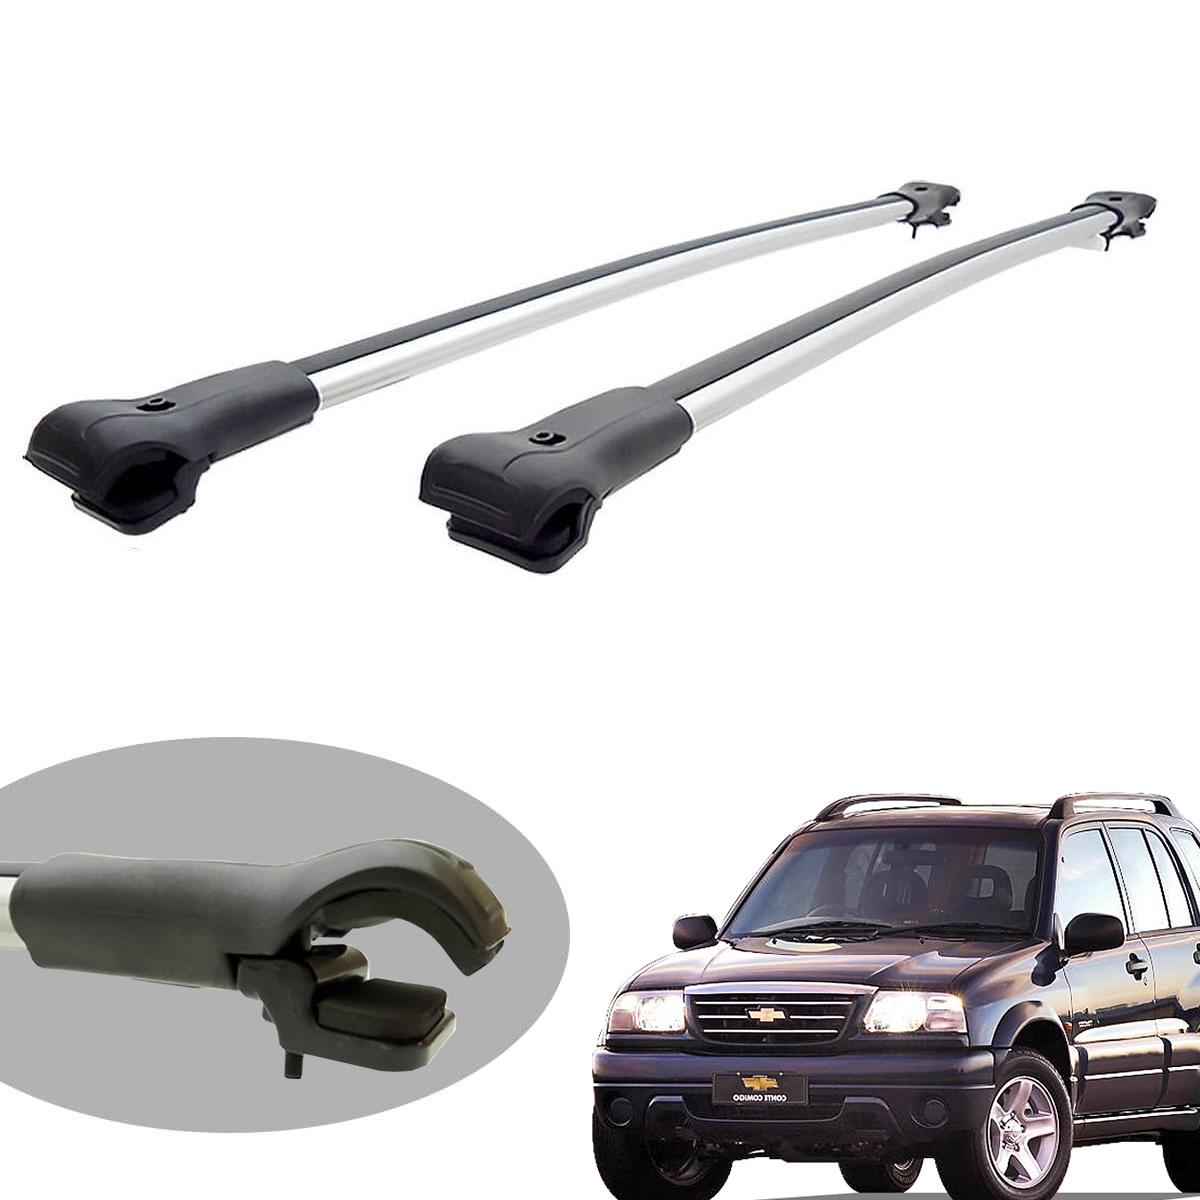 Travessa rack de teto larga alumínio Tracker 1999 a 2009